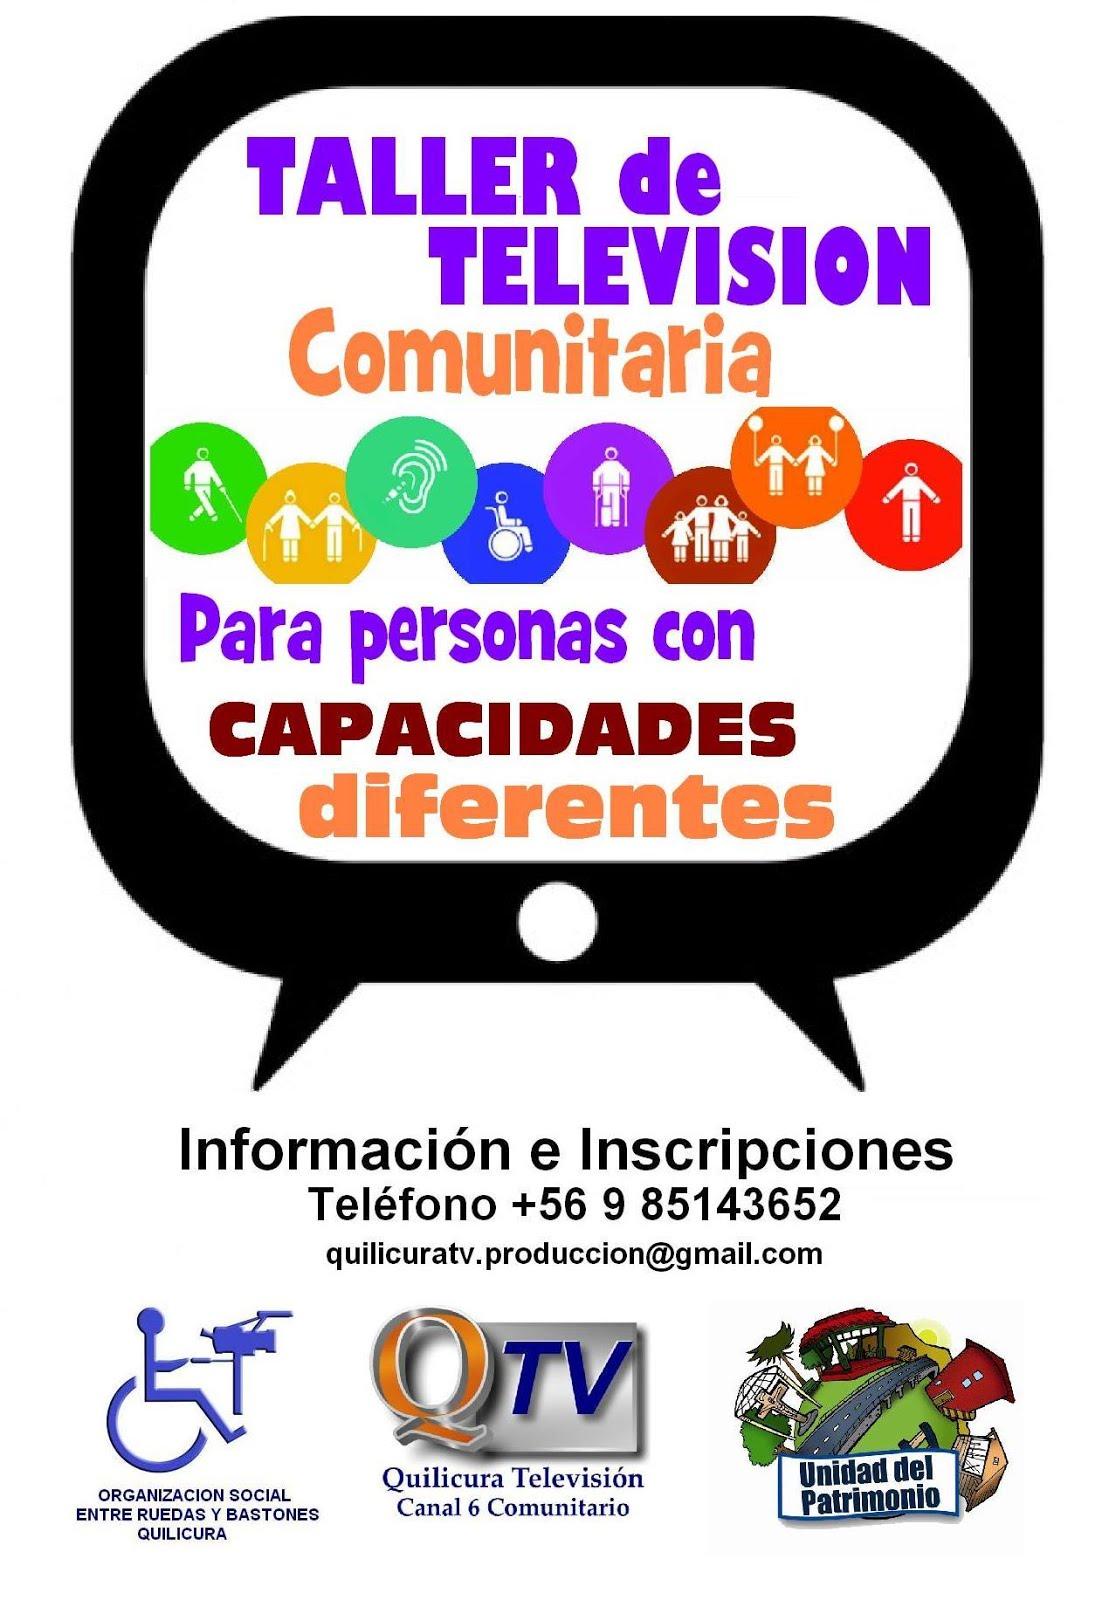 TALLER DE TELEVISION COMUNITARIA PARA PERSONAS CON CAPACIDADES DIFERENTES EN QUILICURA